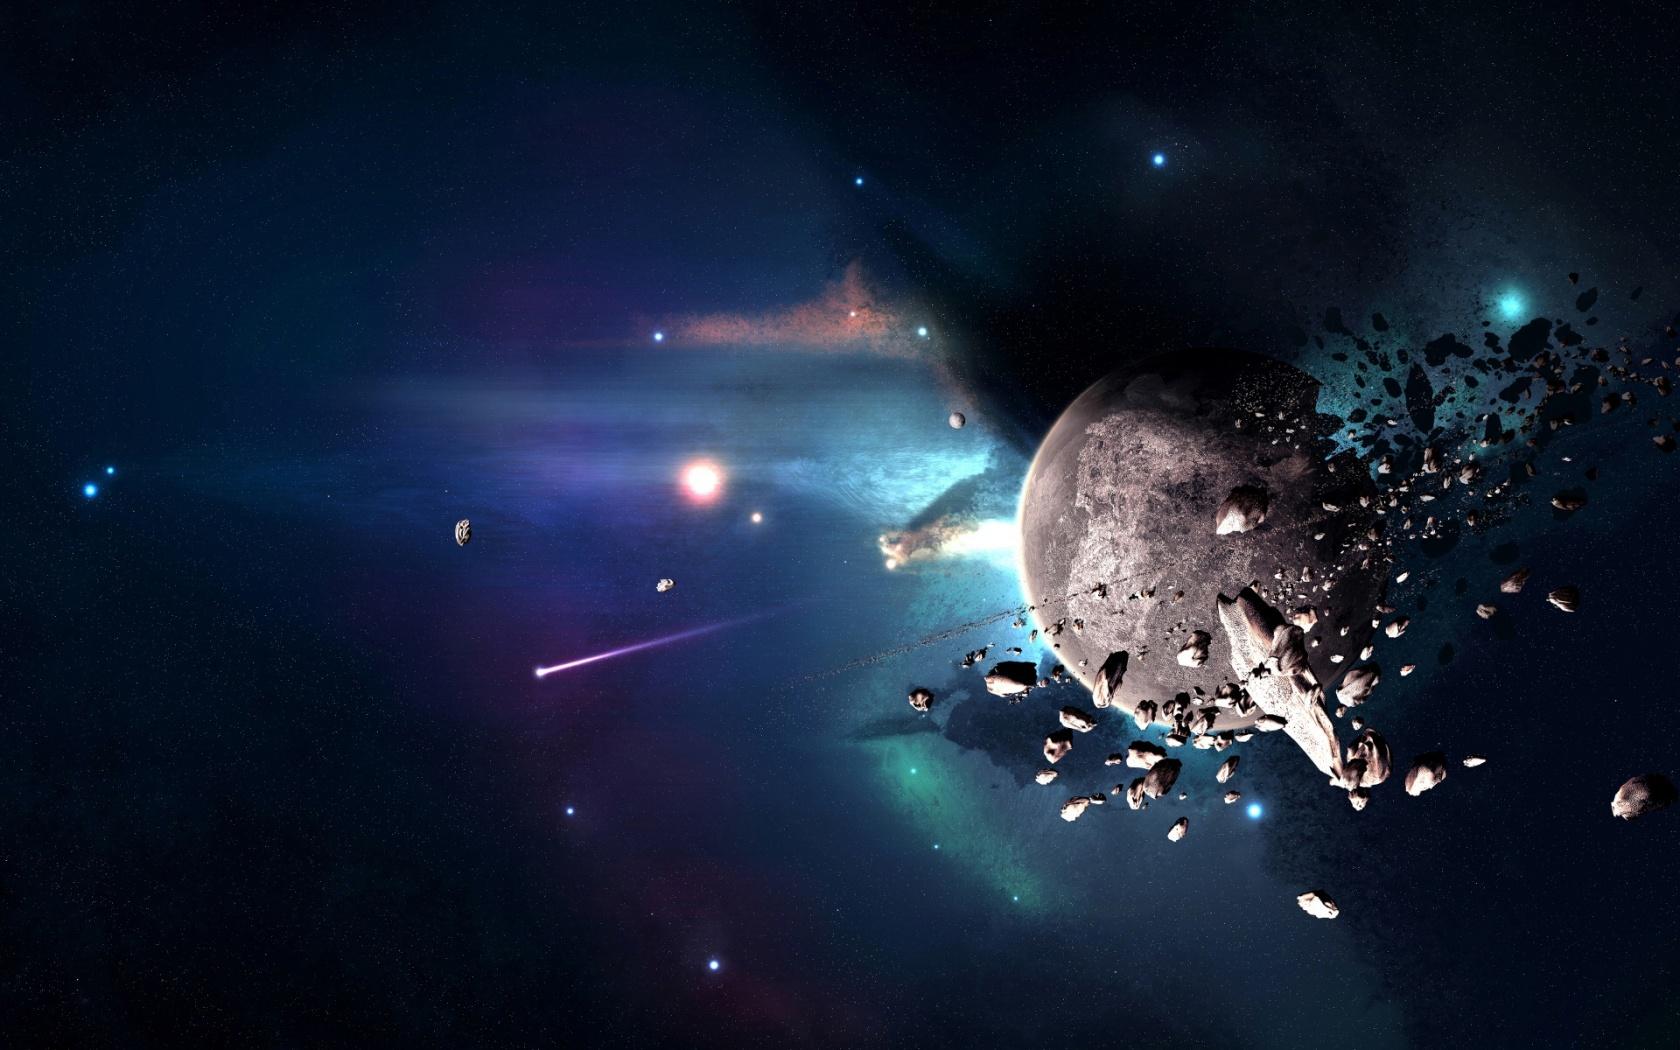 Popular Wallpaper Music Space - space_debris-1680x1050  Photograph_67726.jpg